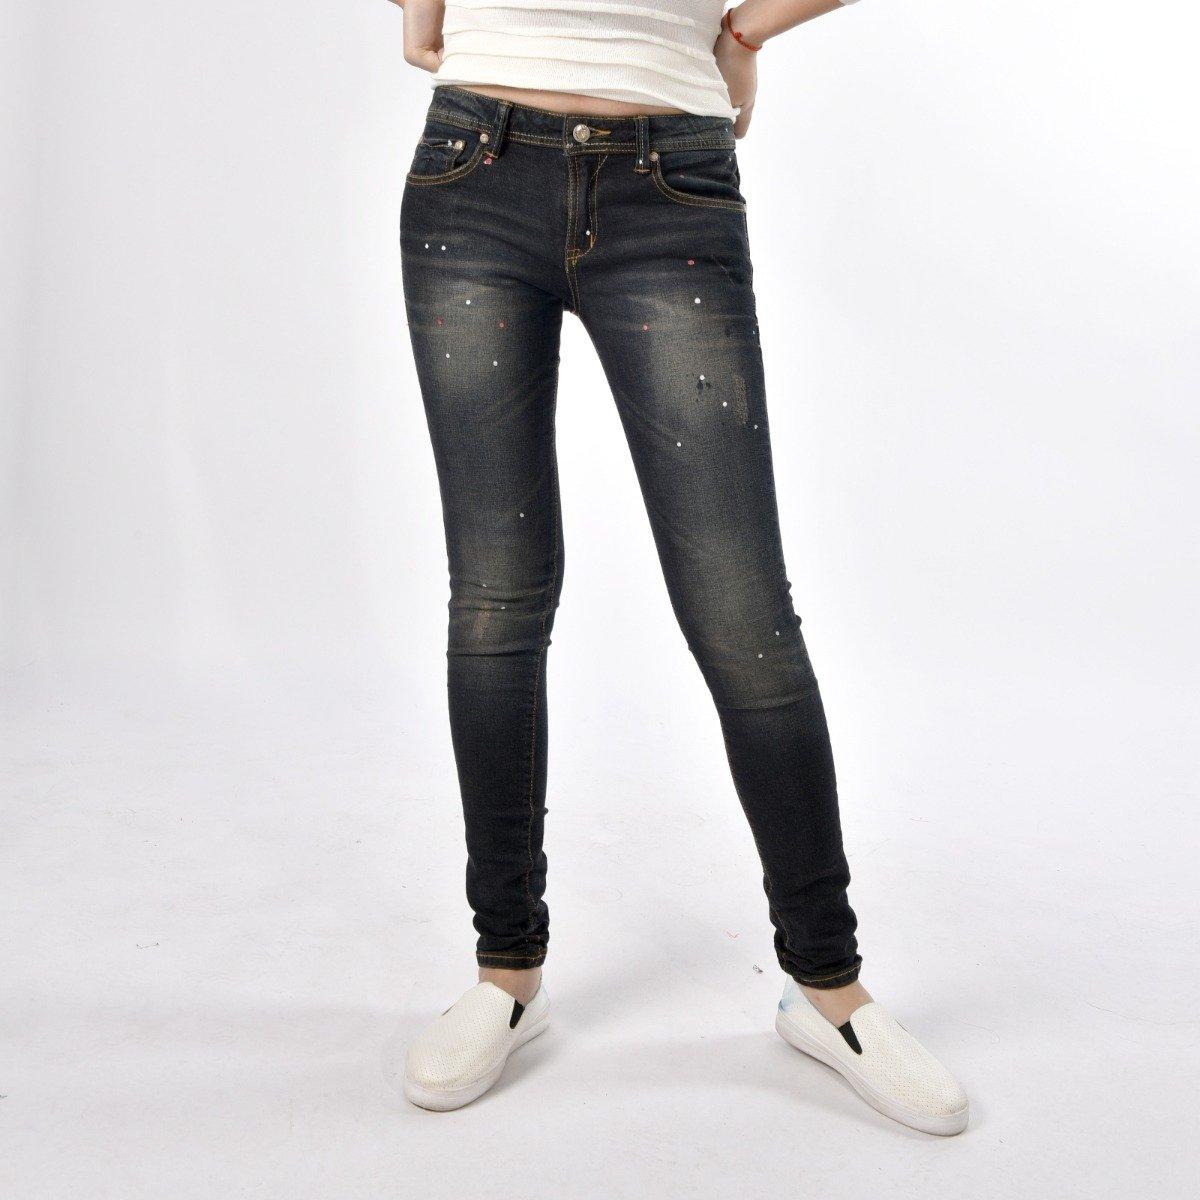 Quần jeans - WCJ6000